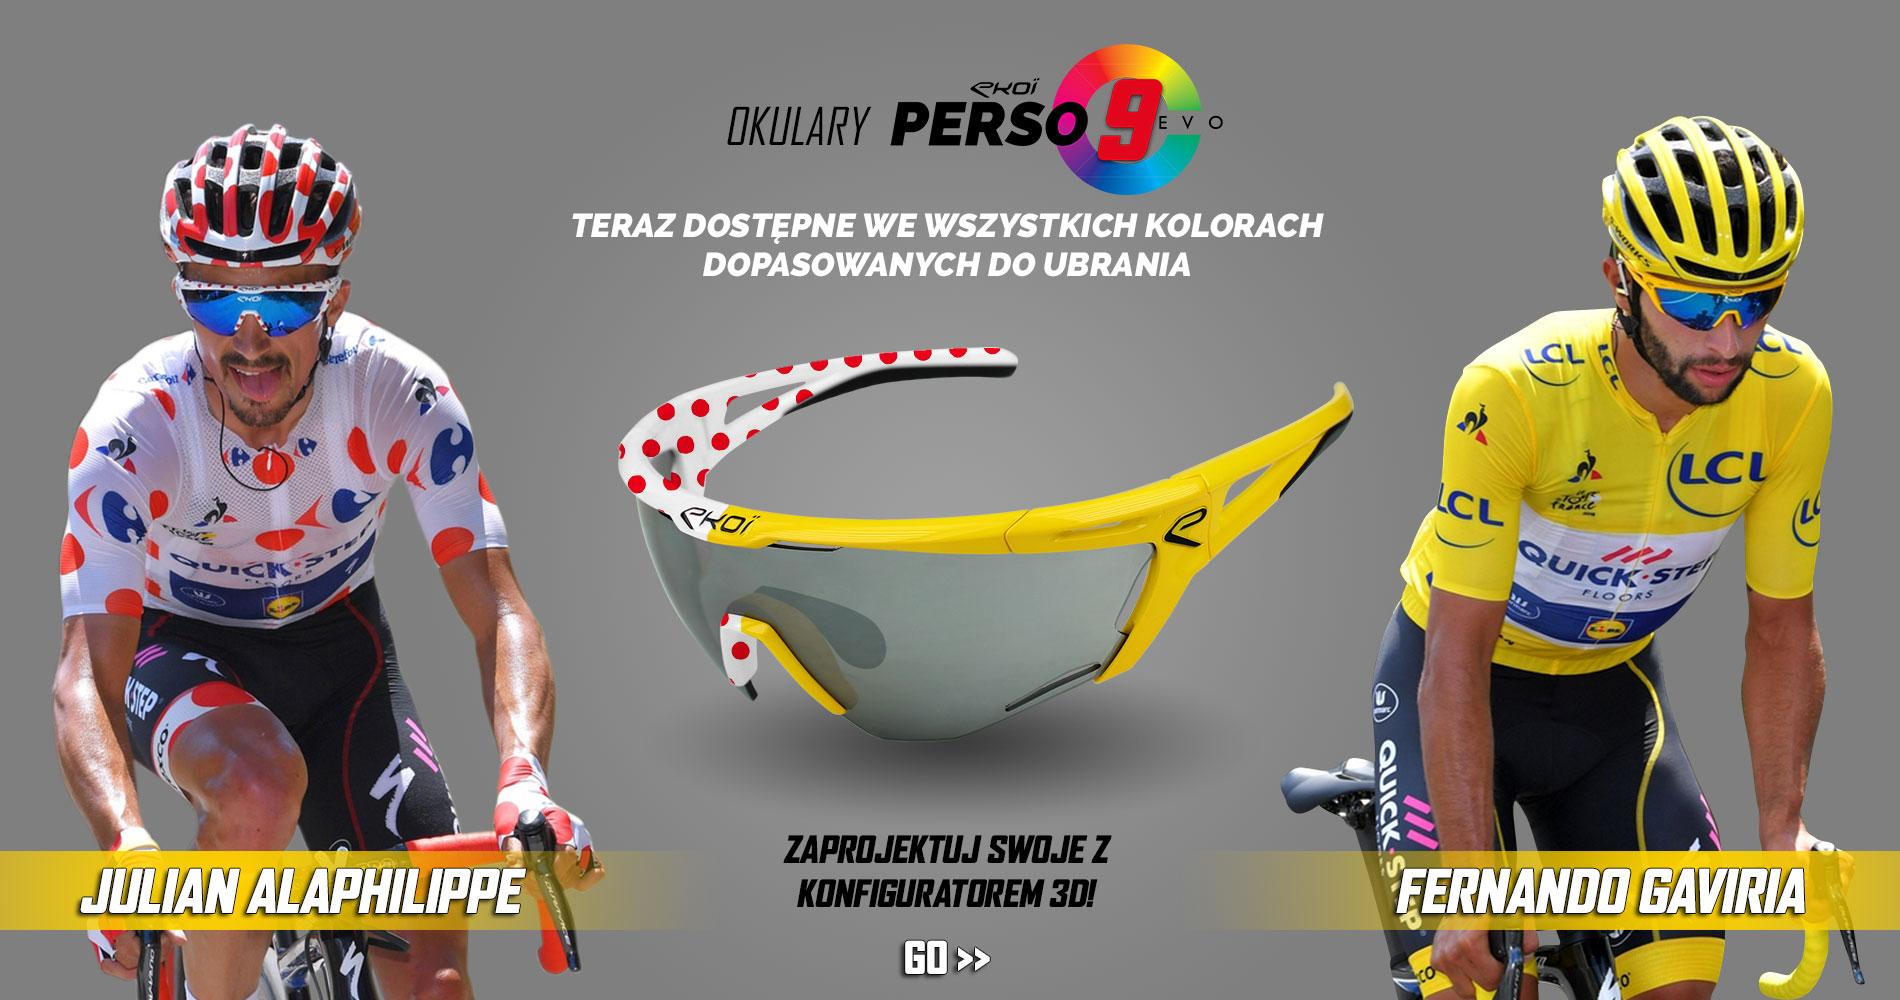 Lunettes EKOI PERSO EVO 9 Fernando Gaviria Tour de France 2018